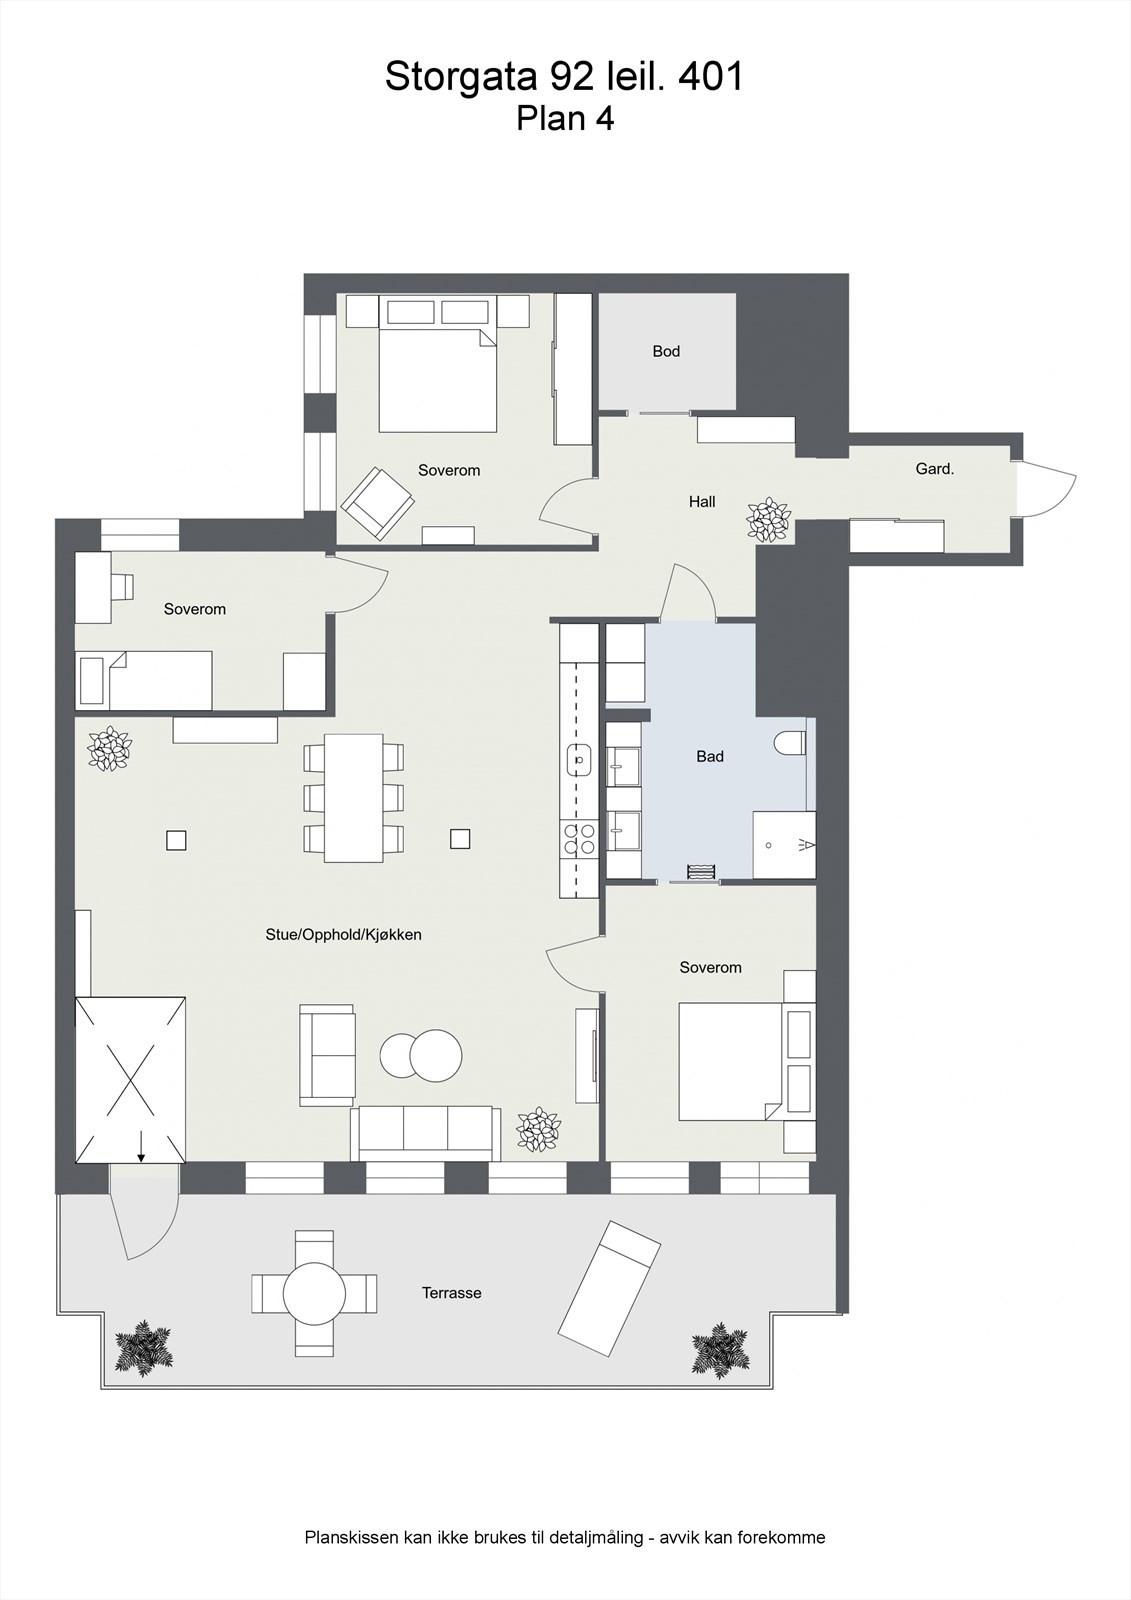 Floorplan letterhead - Storgata 92 leil. 401 - Plan 4 - 2D Floor Plan.jpg